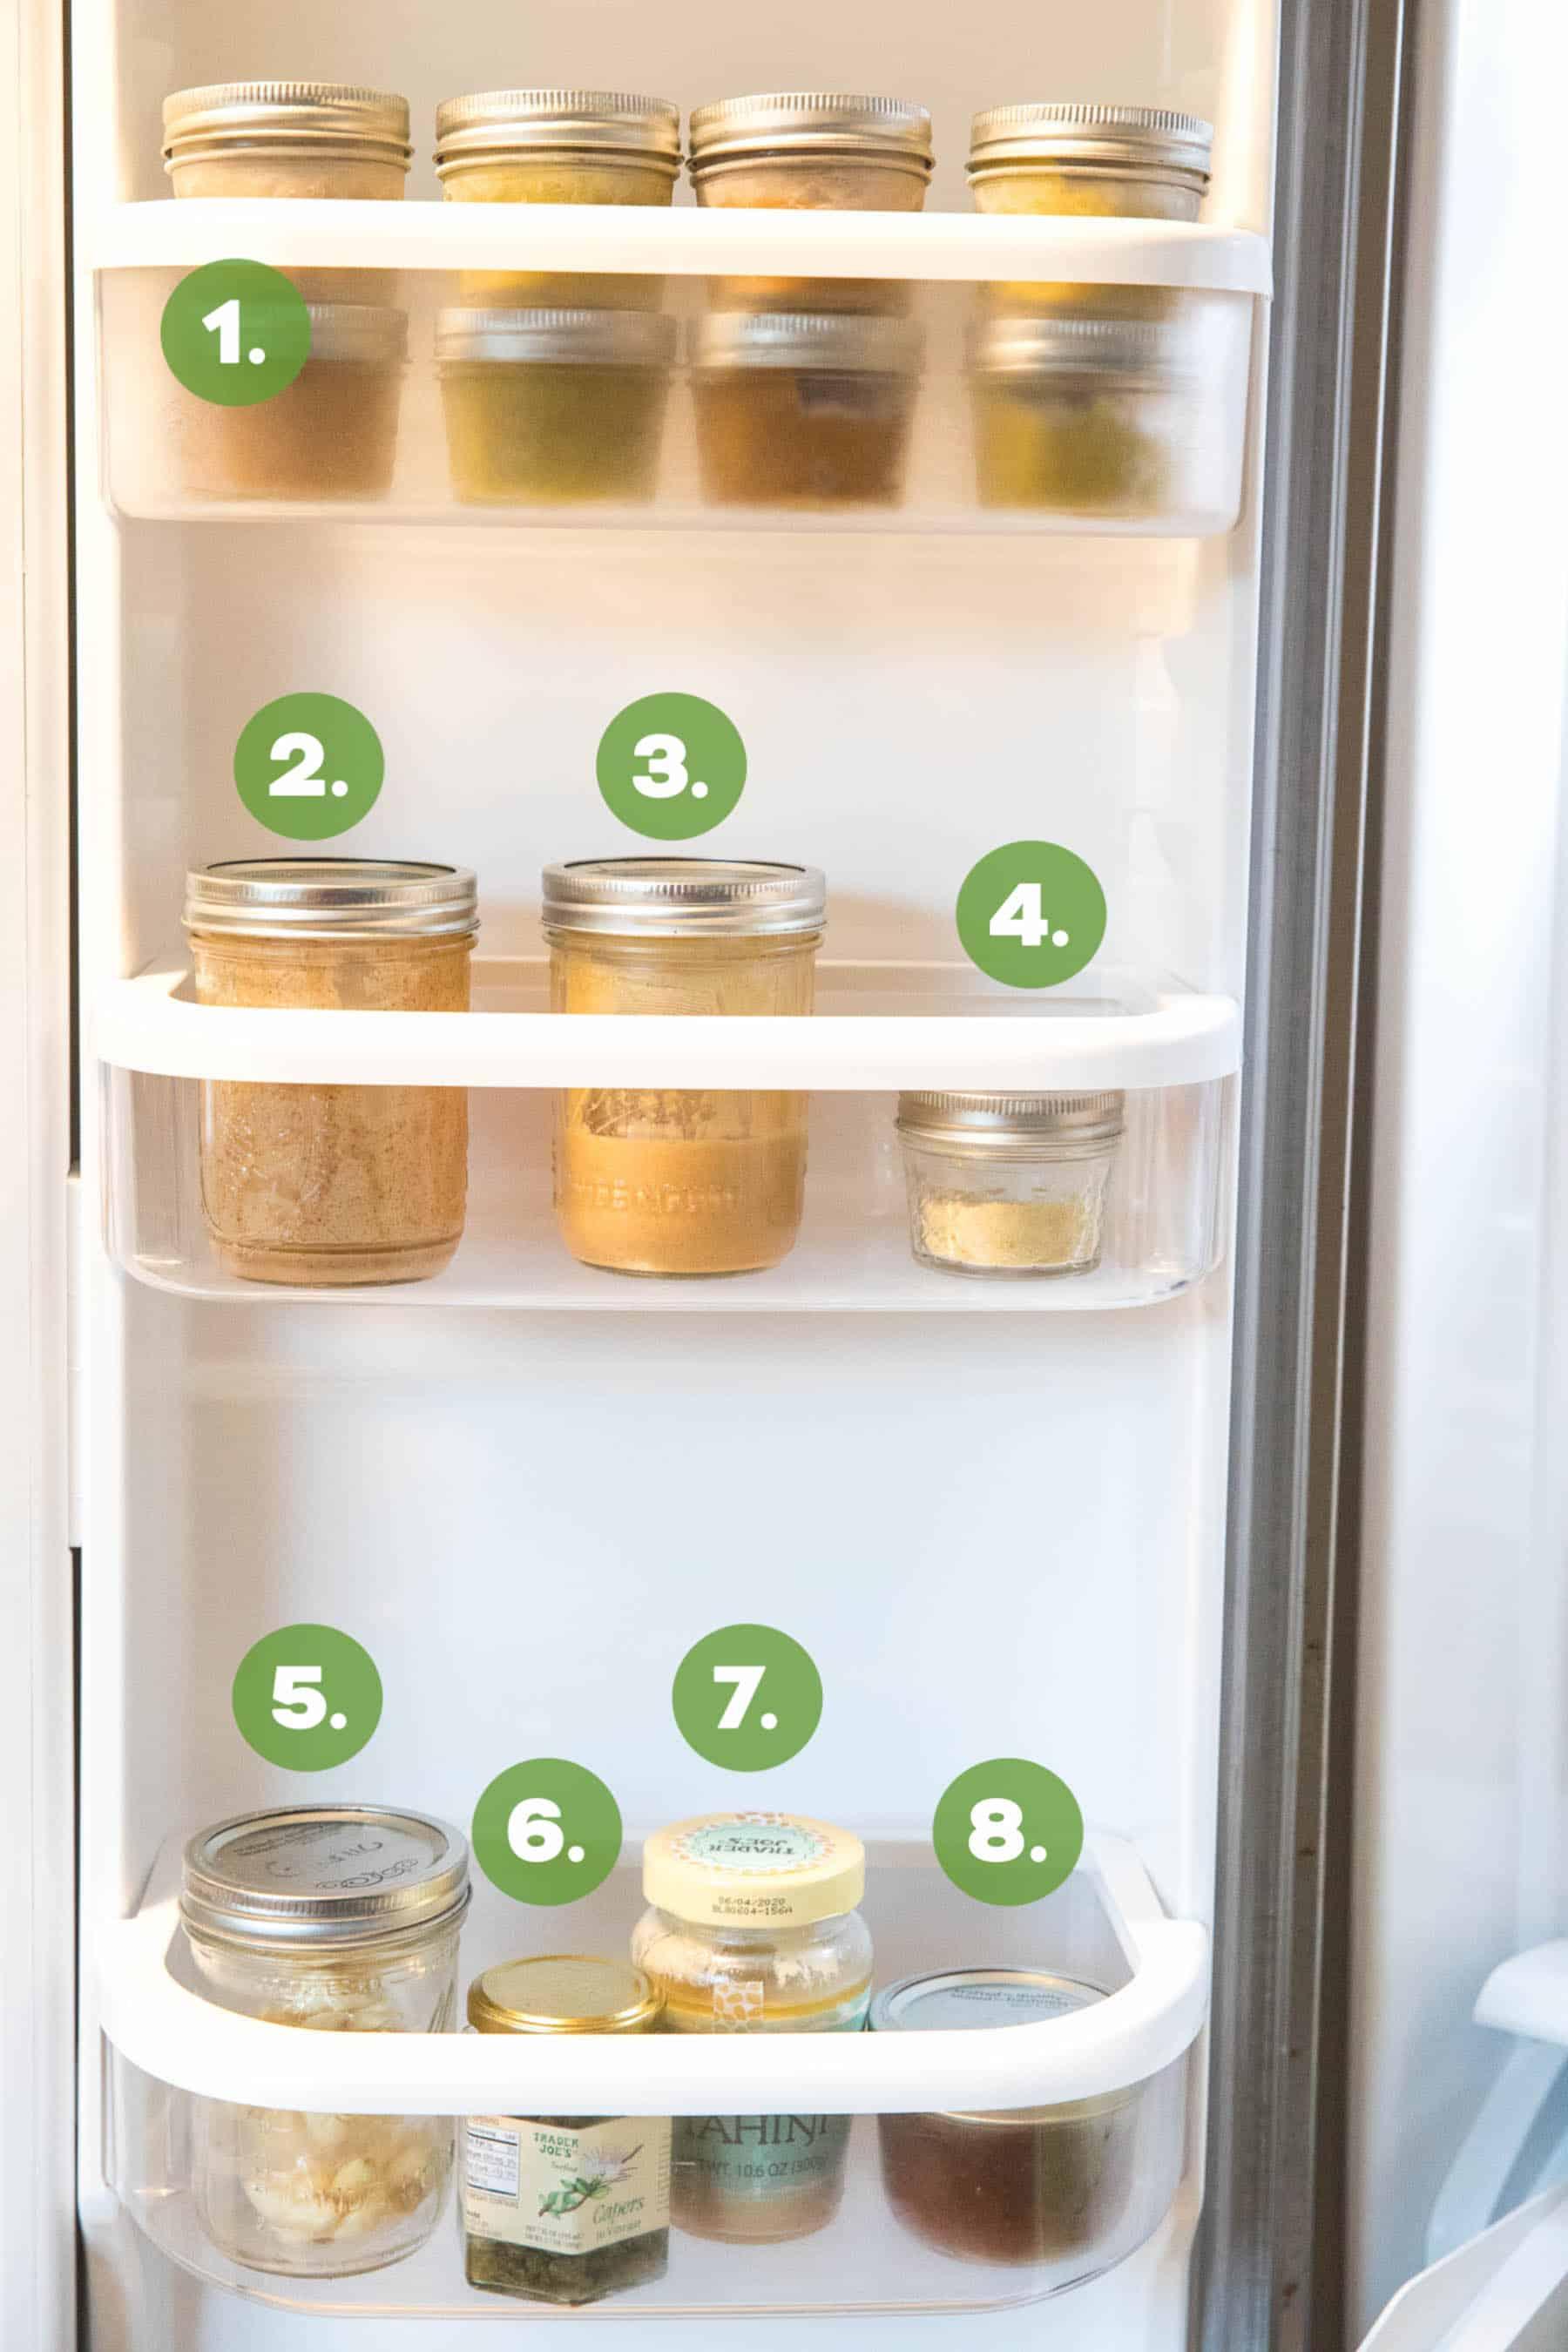 Whole30 stocked refrigerator